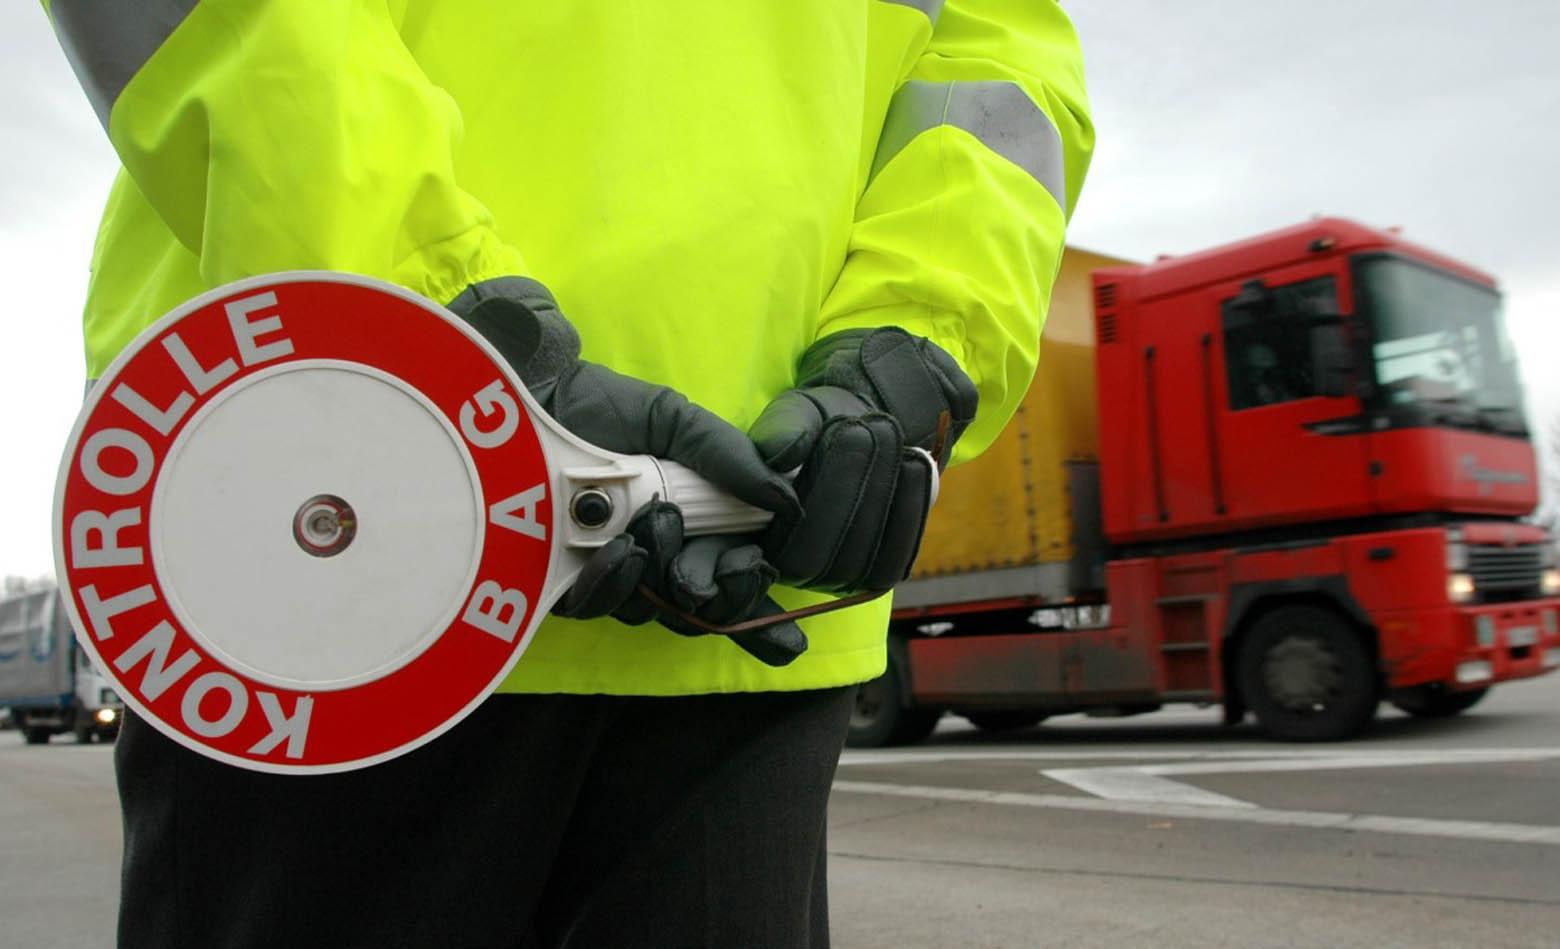 18.000 eura kazne za litvanskog vozača